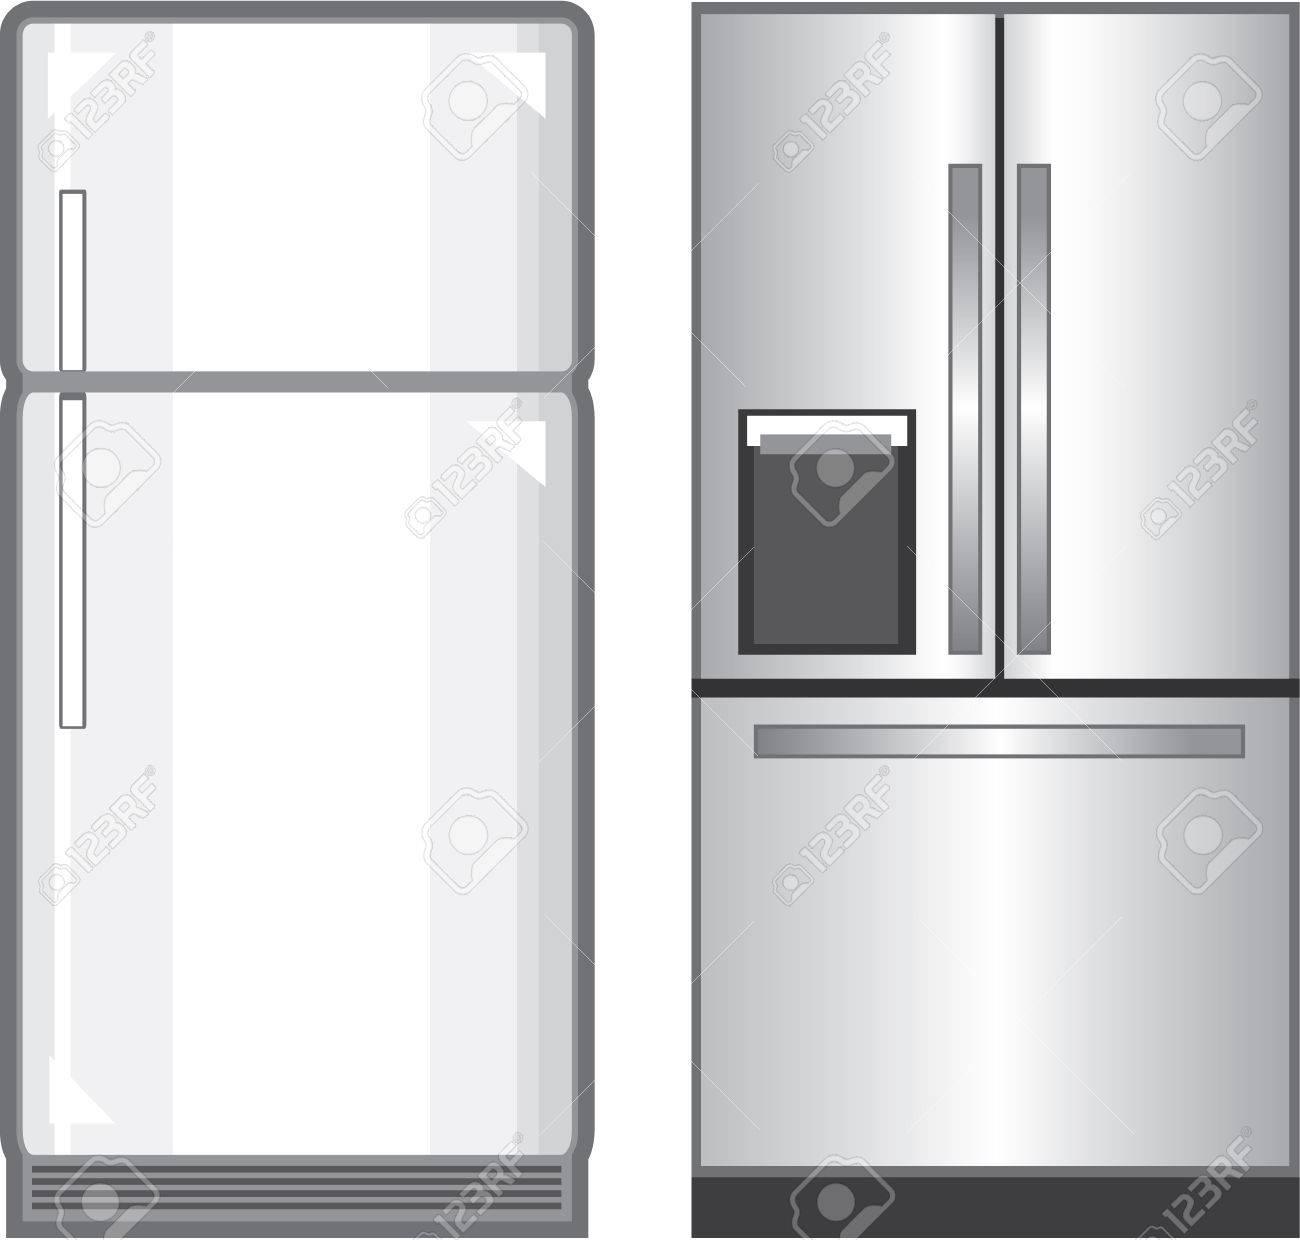 39+ Refrigerator Clipart.